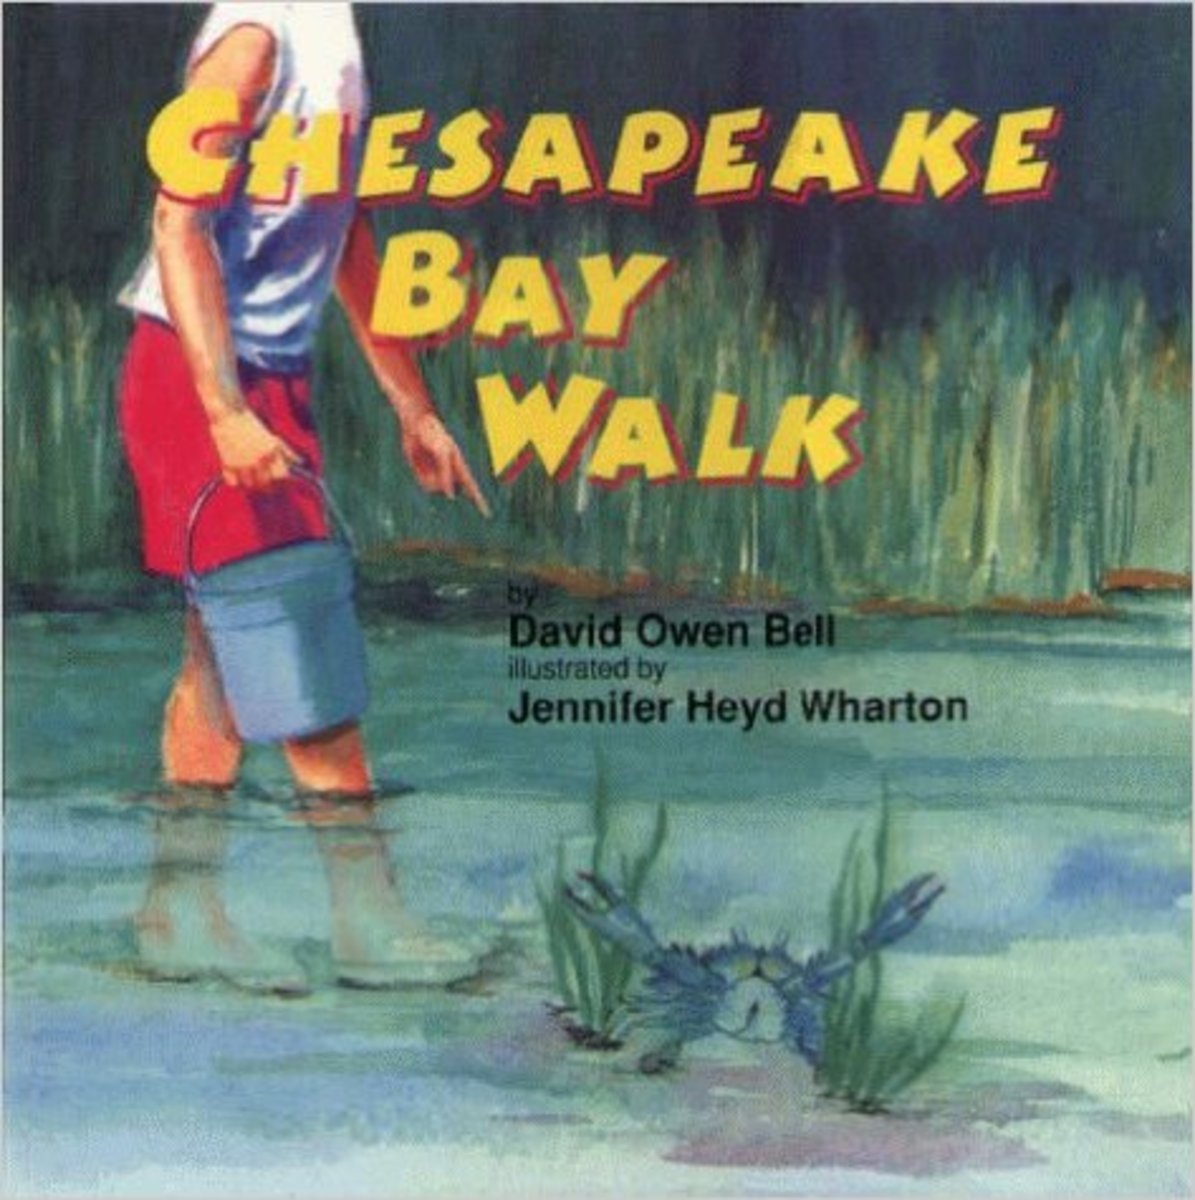 Chesapeake Bay Walk by David Owen Bell